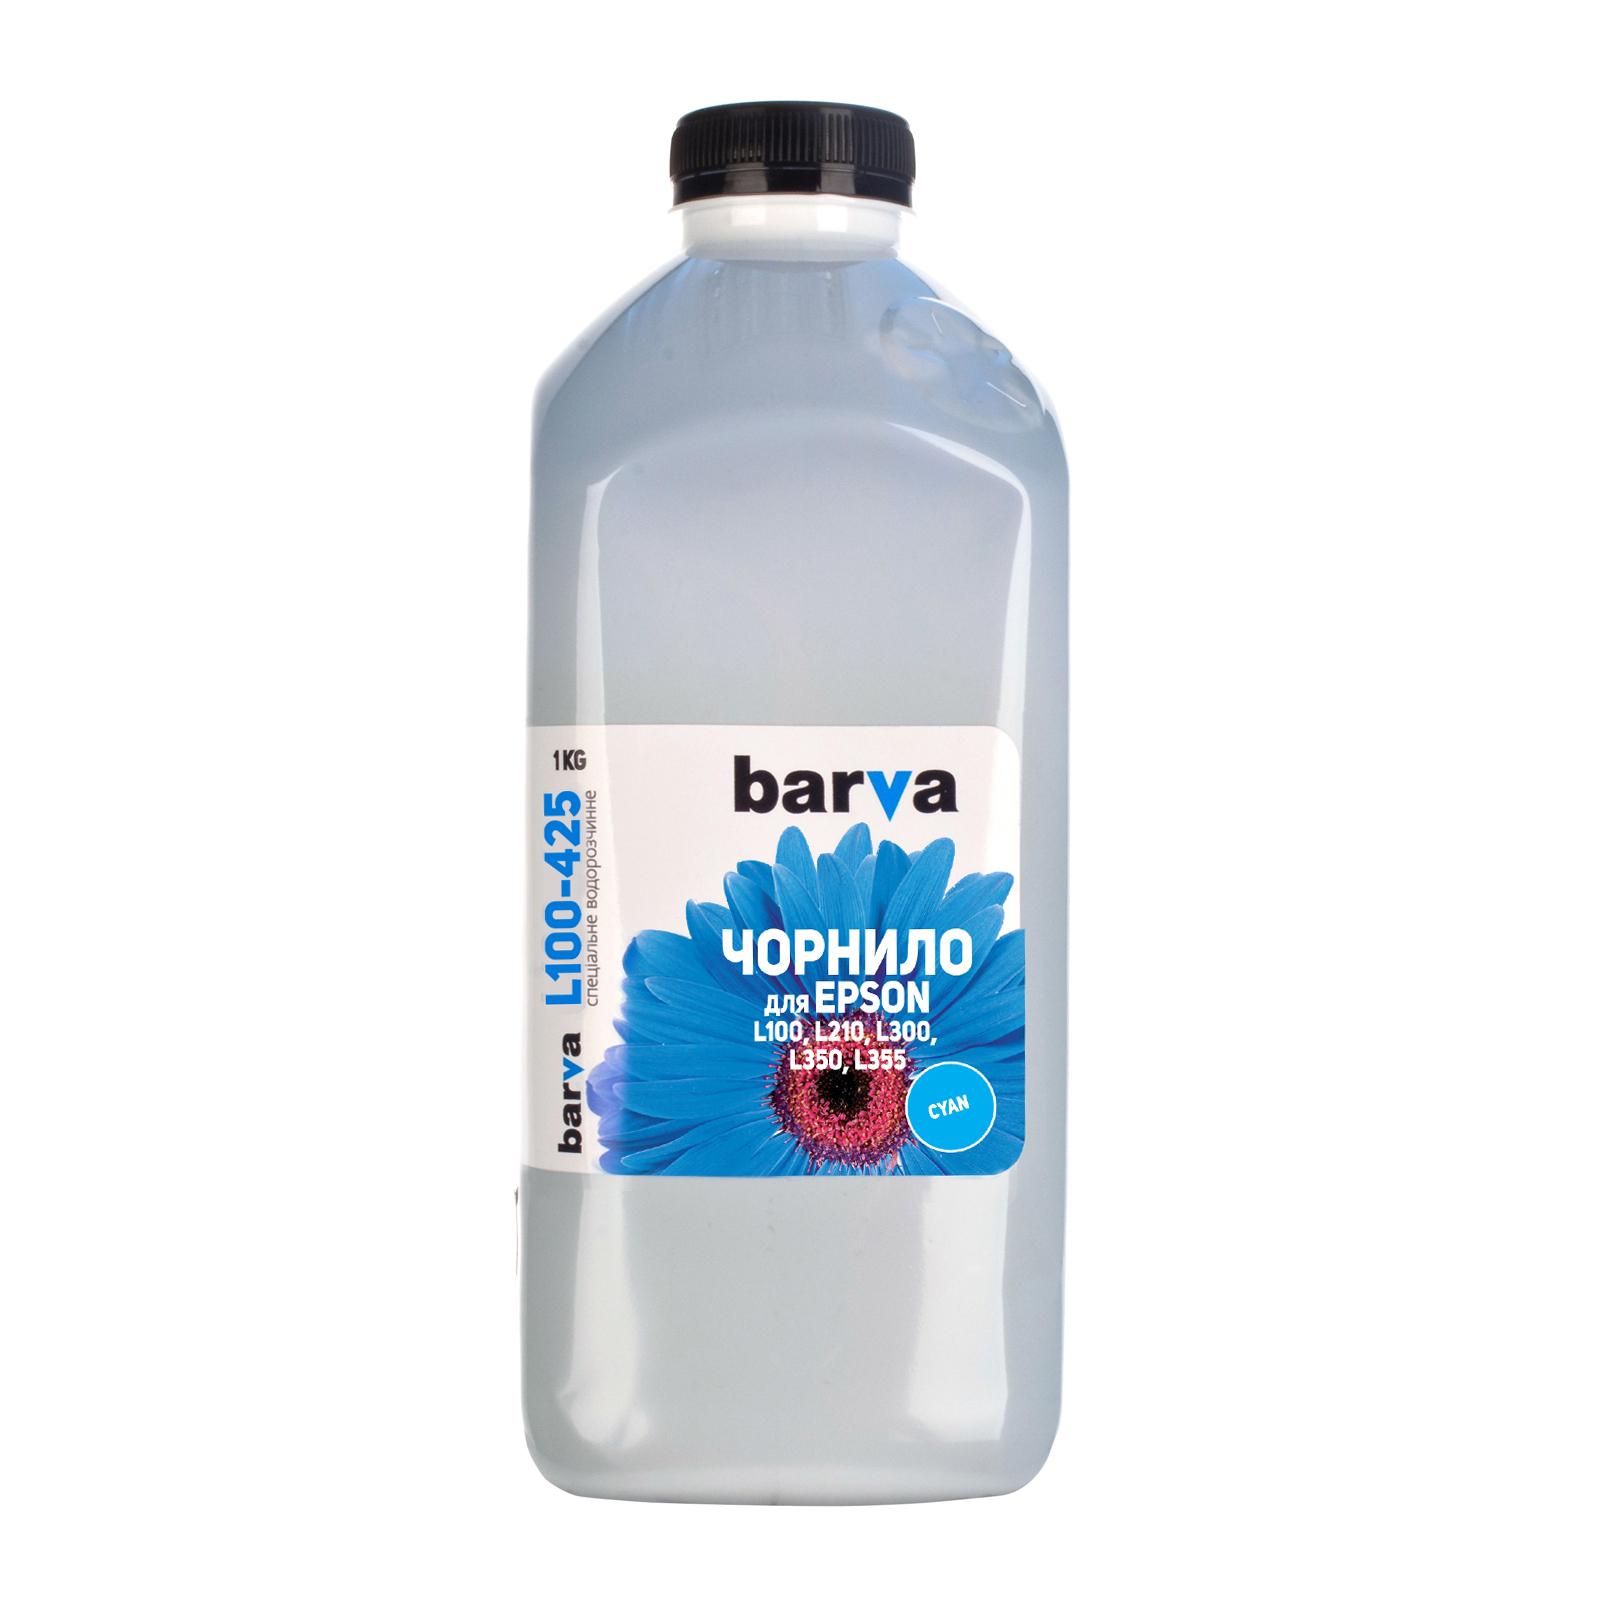 Чернила BARVA EPSON L100/L210/L300/L350/L355 (T6642) 1кг CYAN (L100-425)